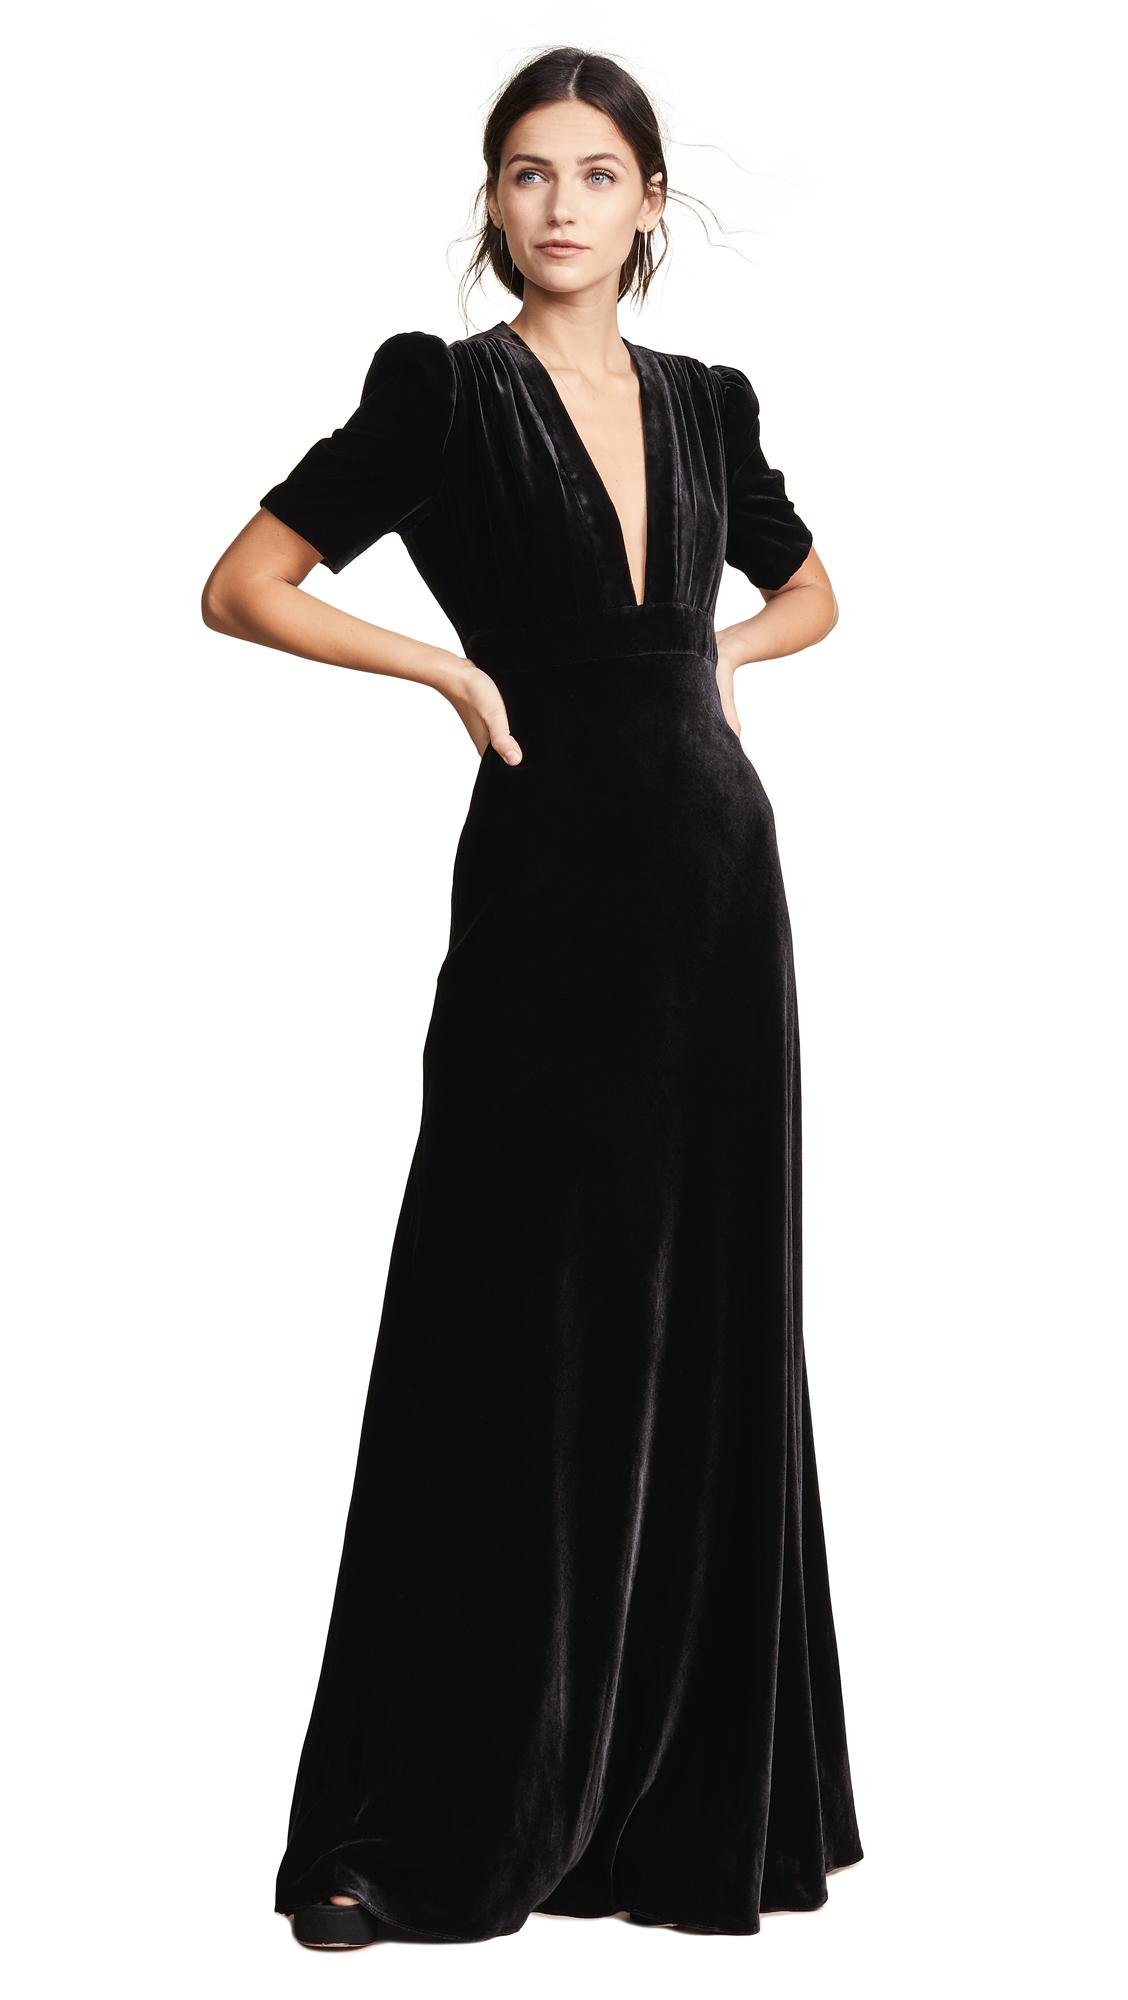 Jill Jill Stuart Short Sleeve Gown - Black